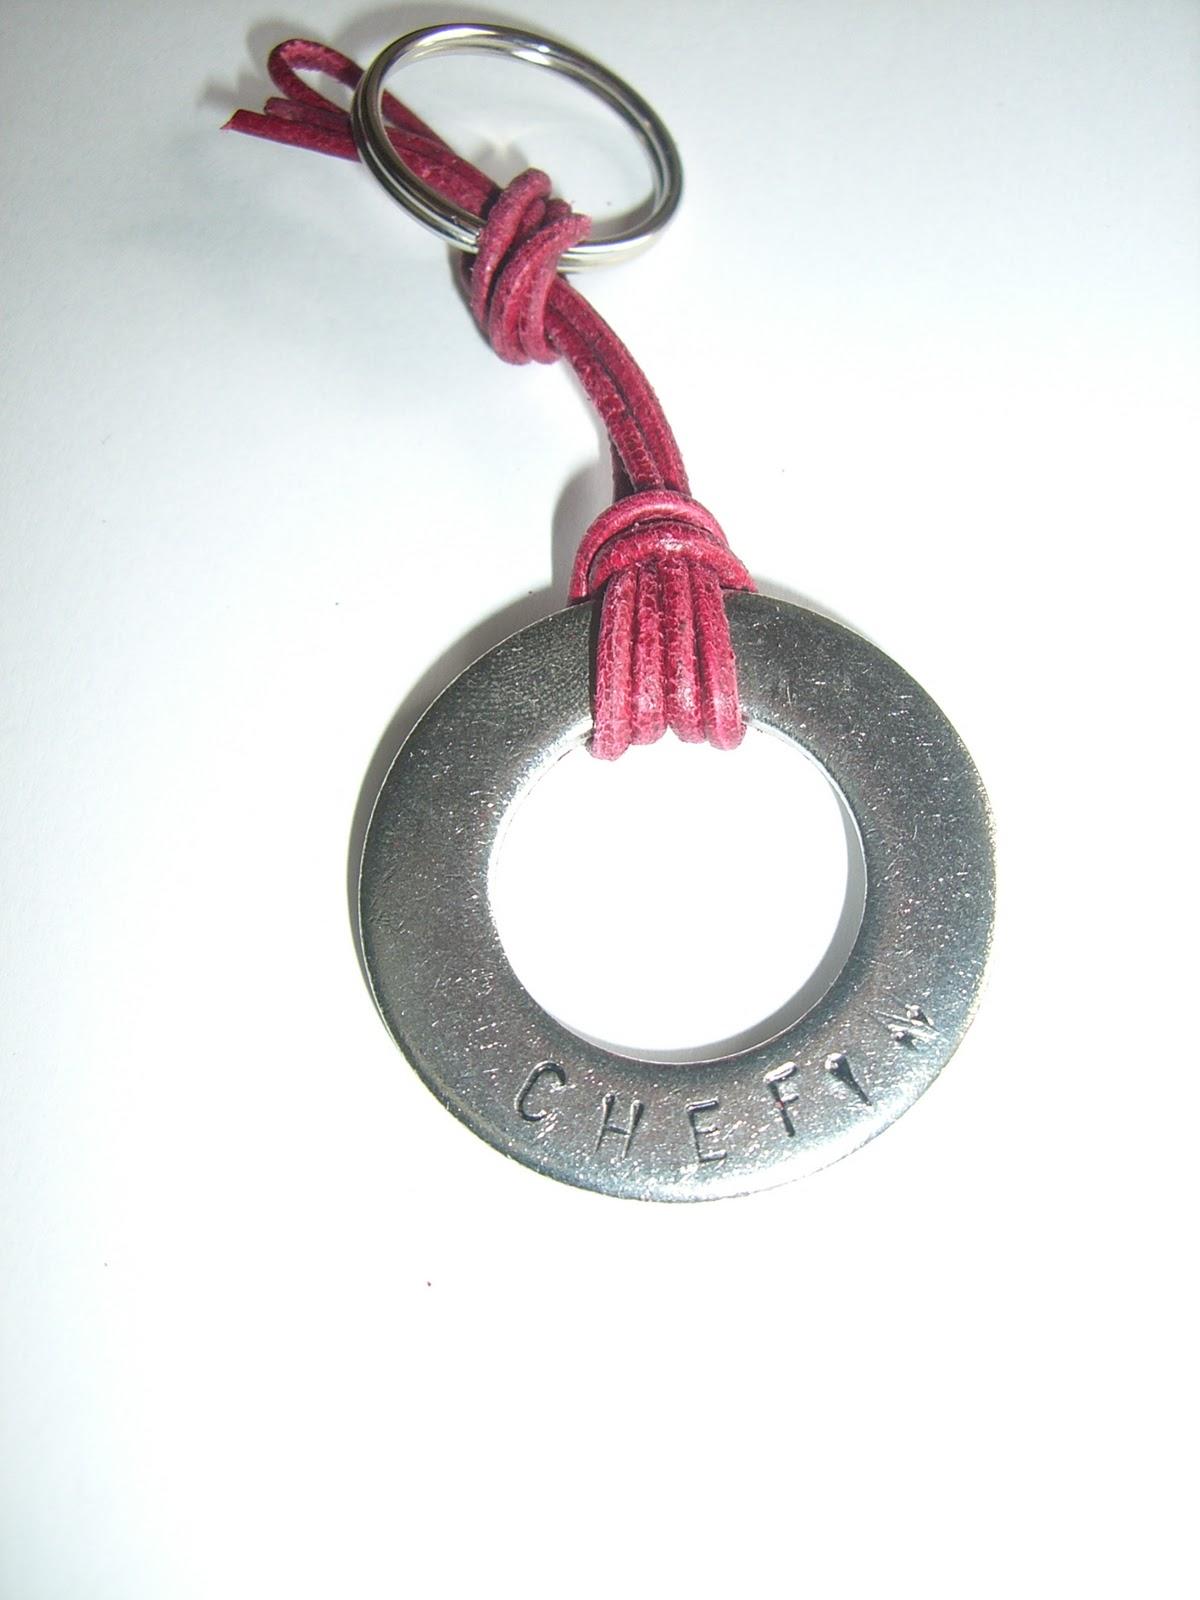 Inspirierend Schlüsselanhänger Selber Machen Knoten Design